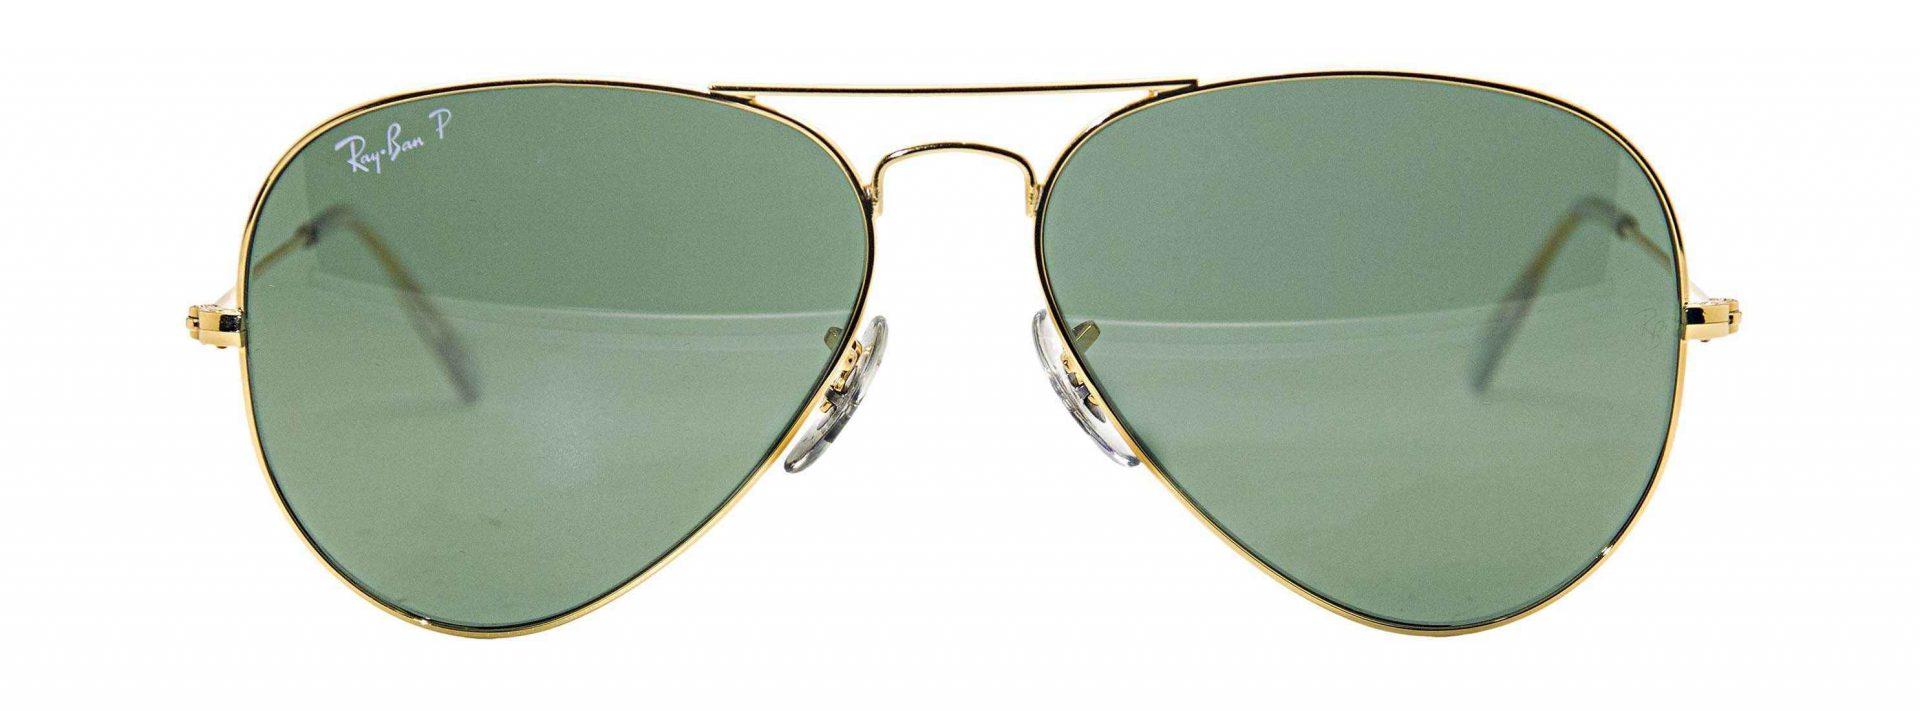 Ray-Ban Sunglasses 3025 01 2970x1100 1